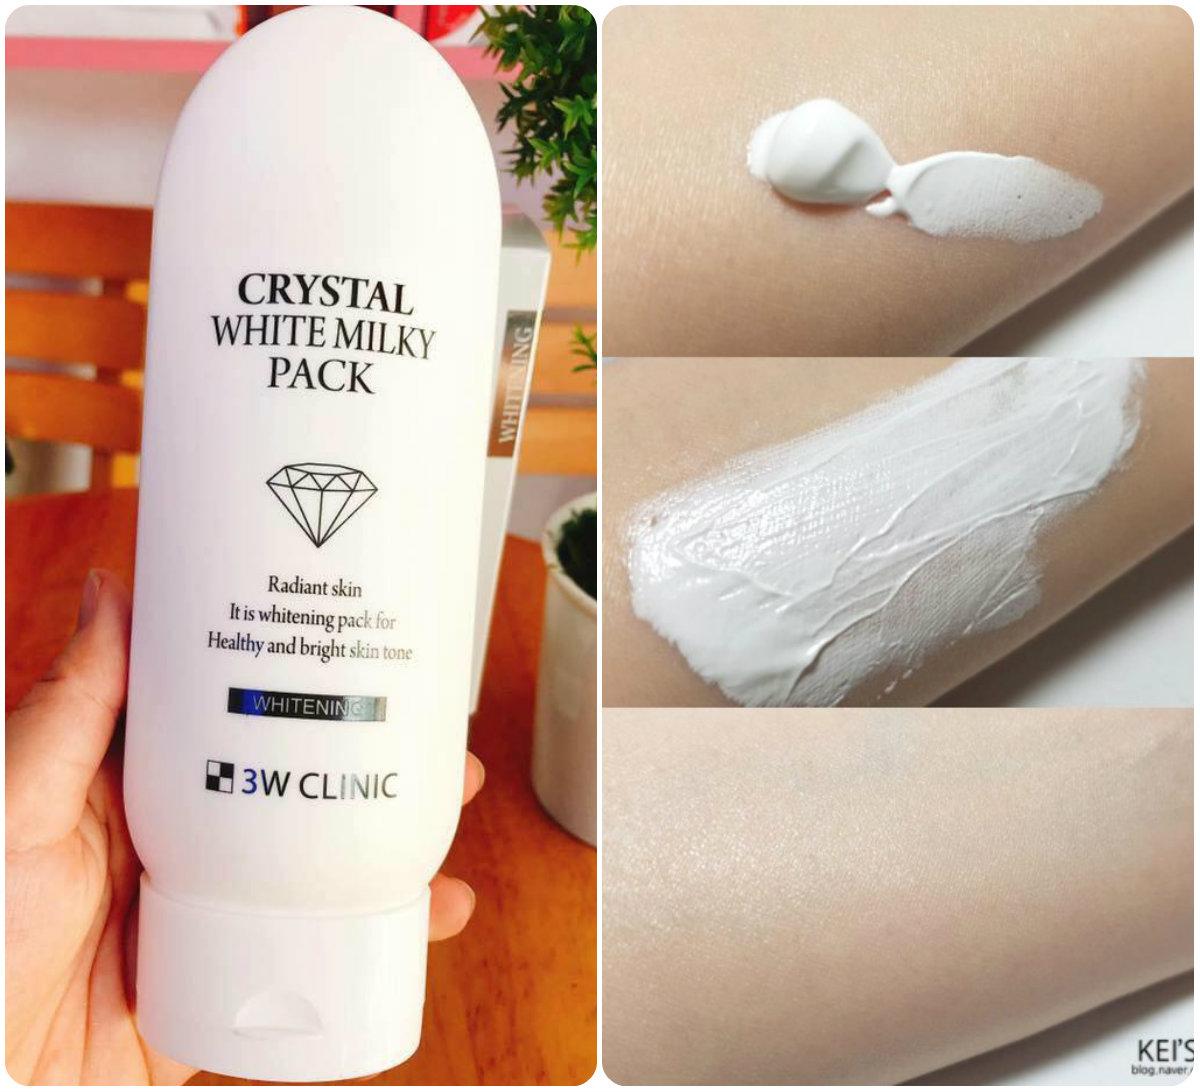 Kem Tắm Trắng Da 3W Clinic Crystal Whitening Milky Pack 200g